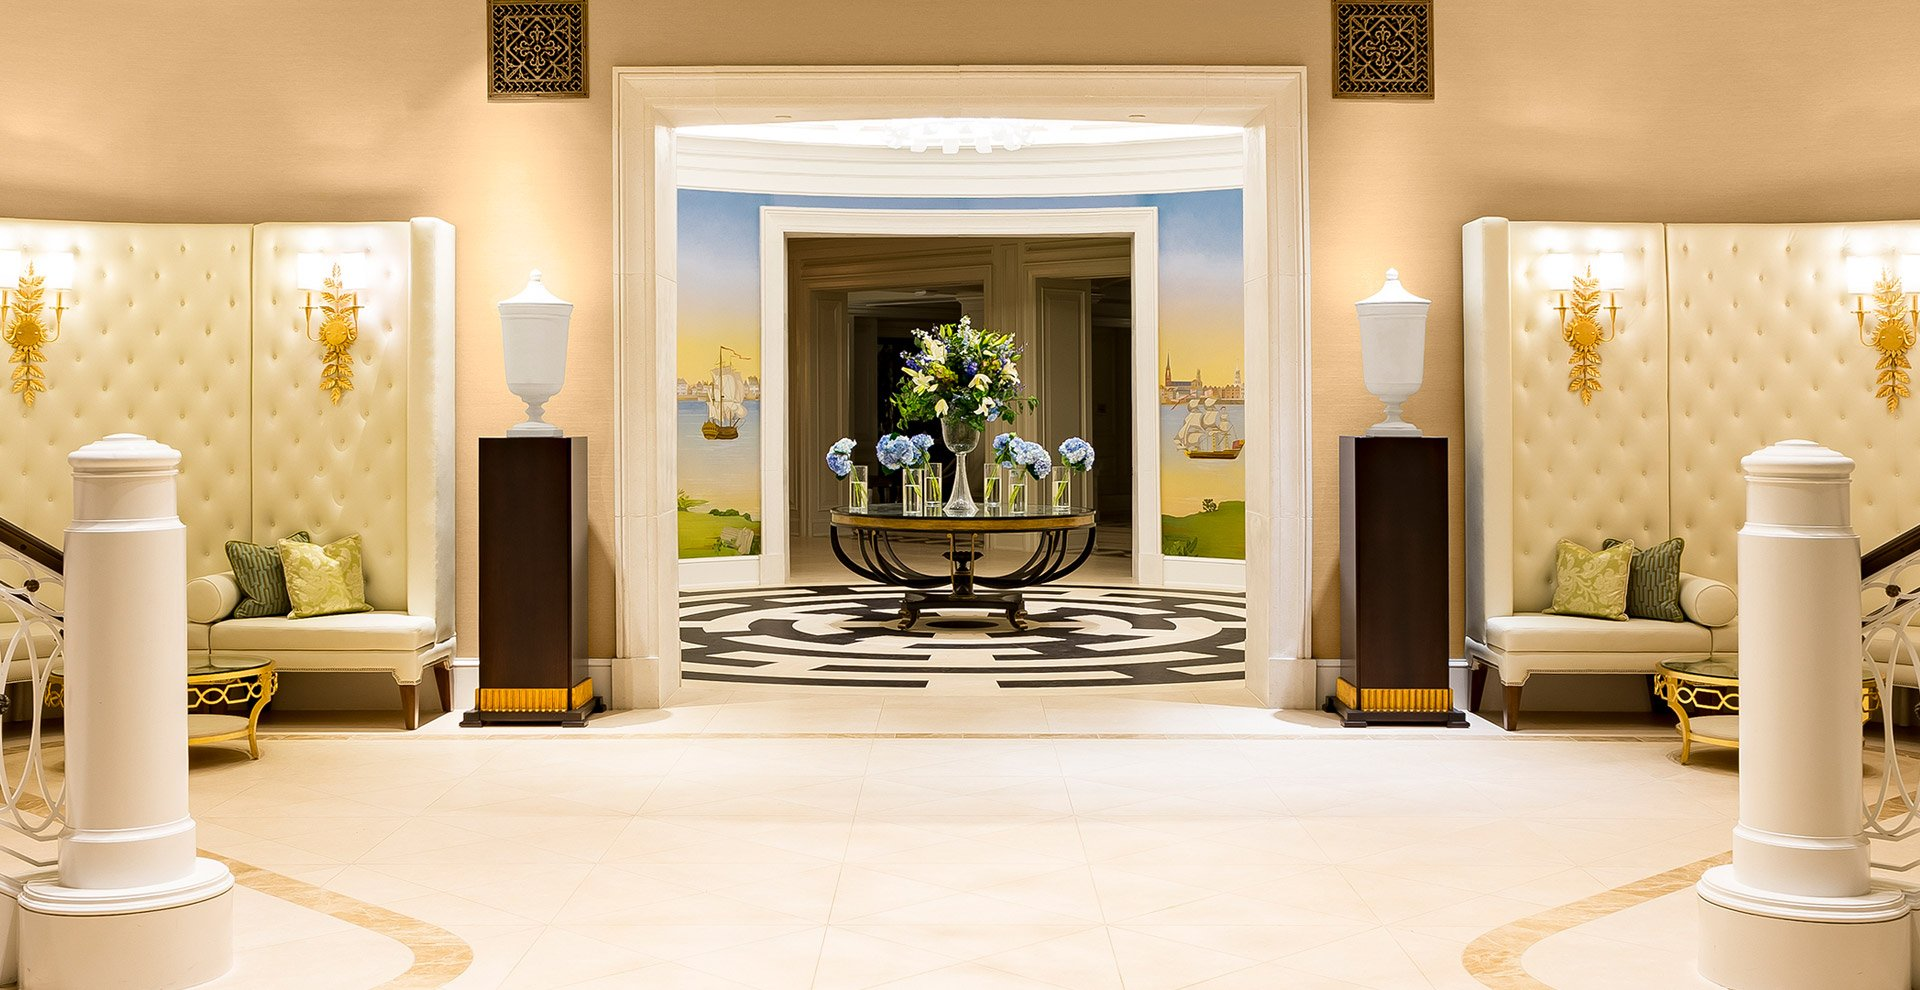 Luxury Urban Hotel Management Company Salamander Hotels Resorts